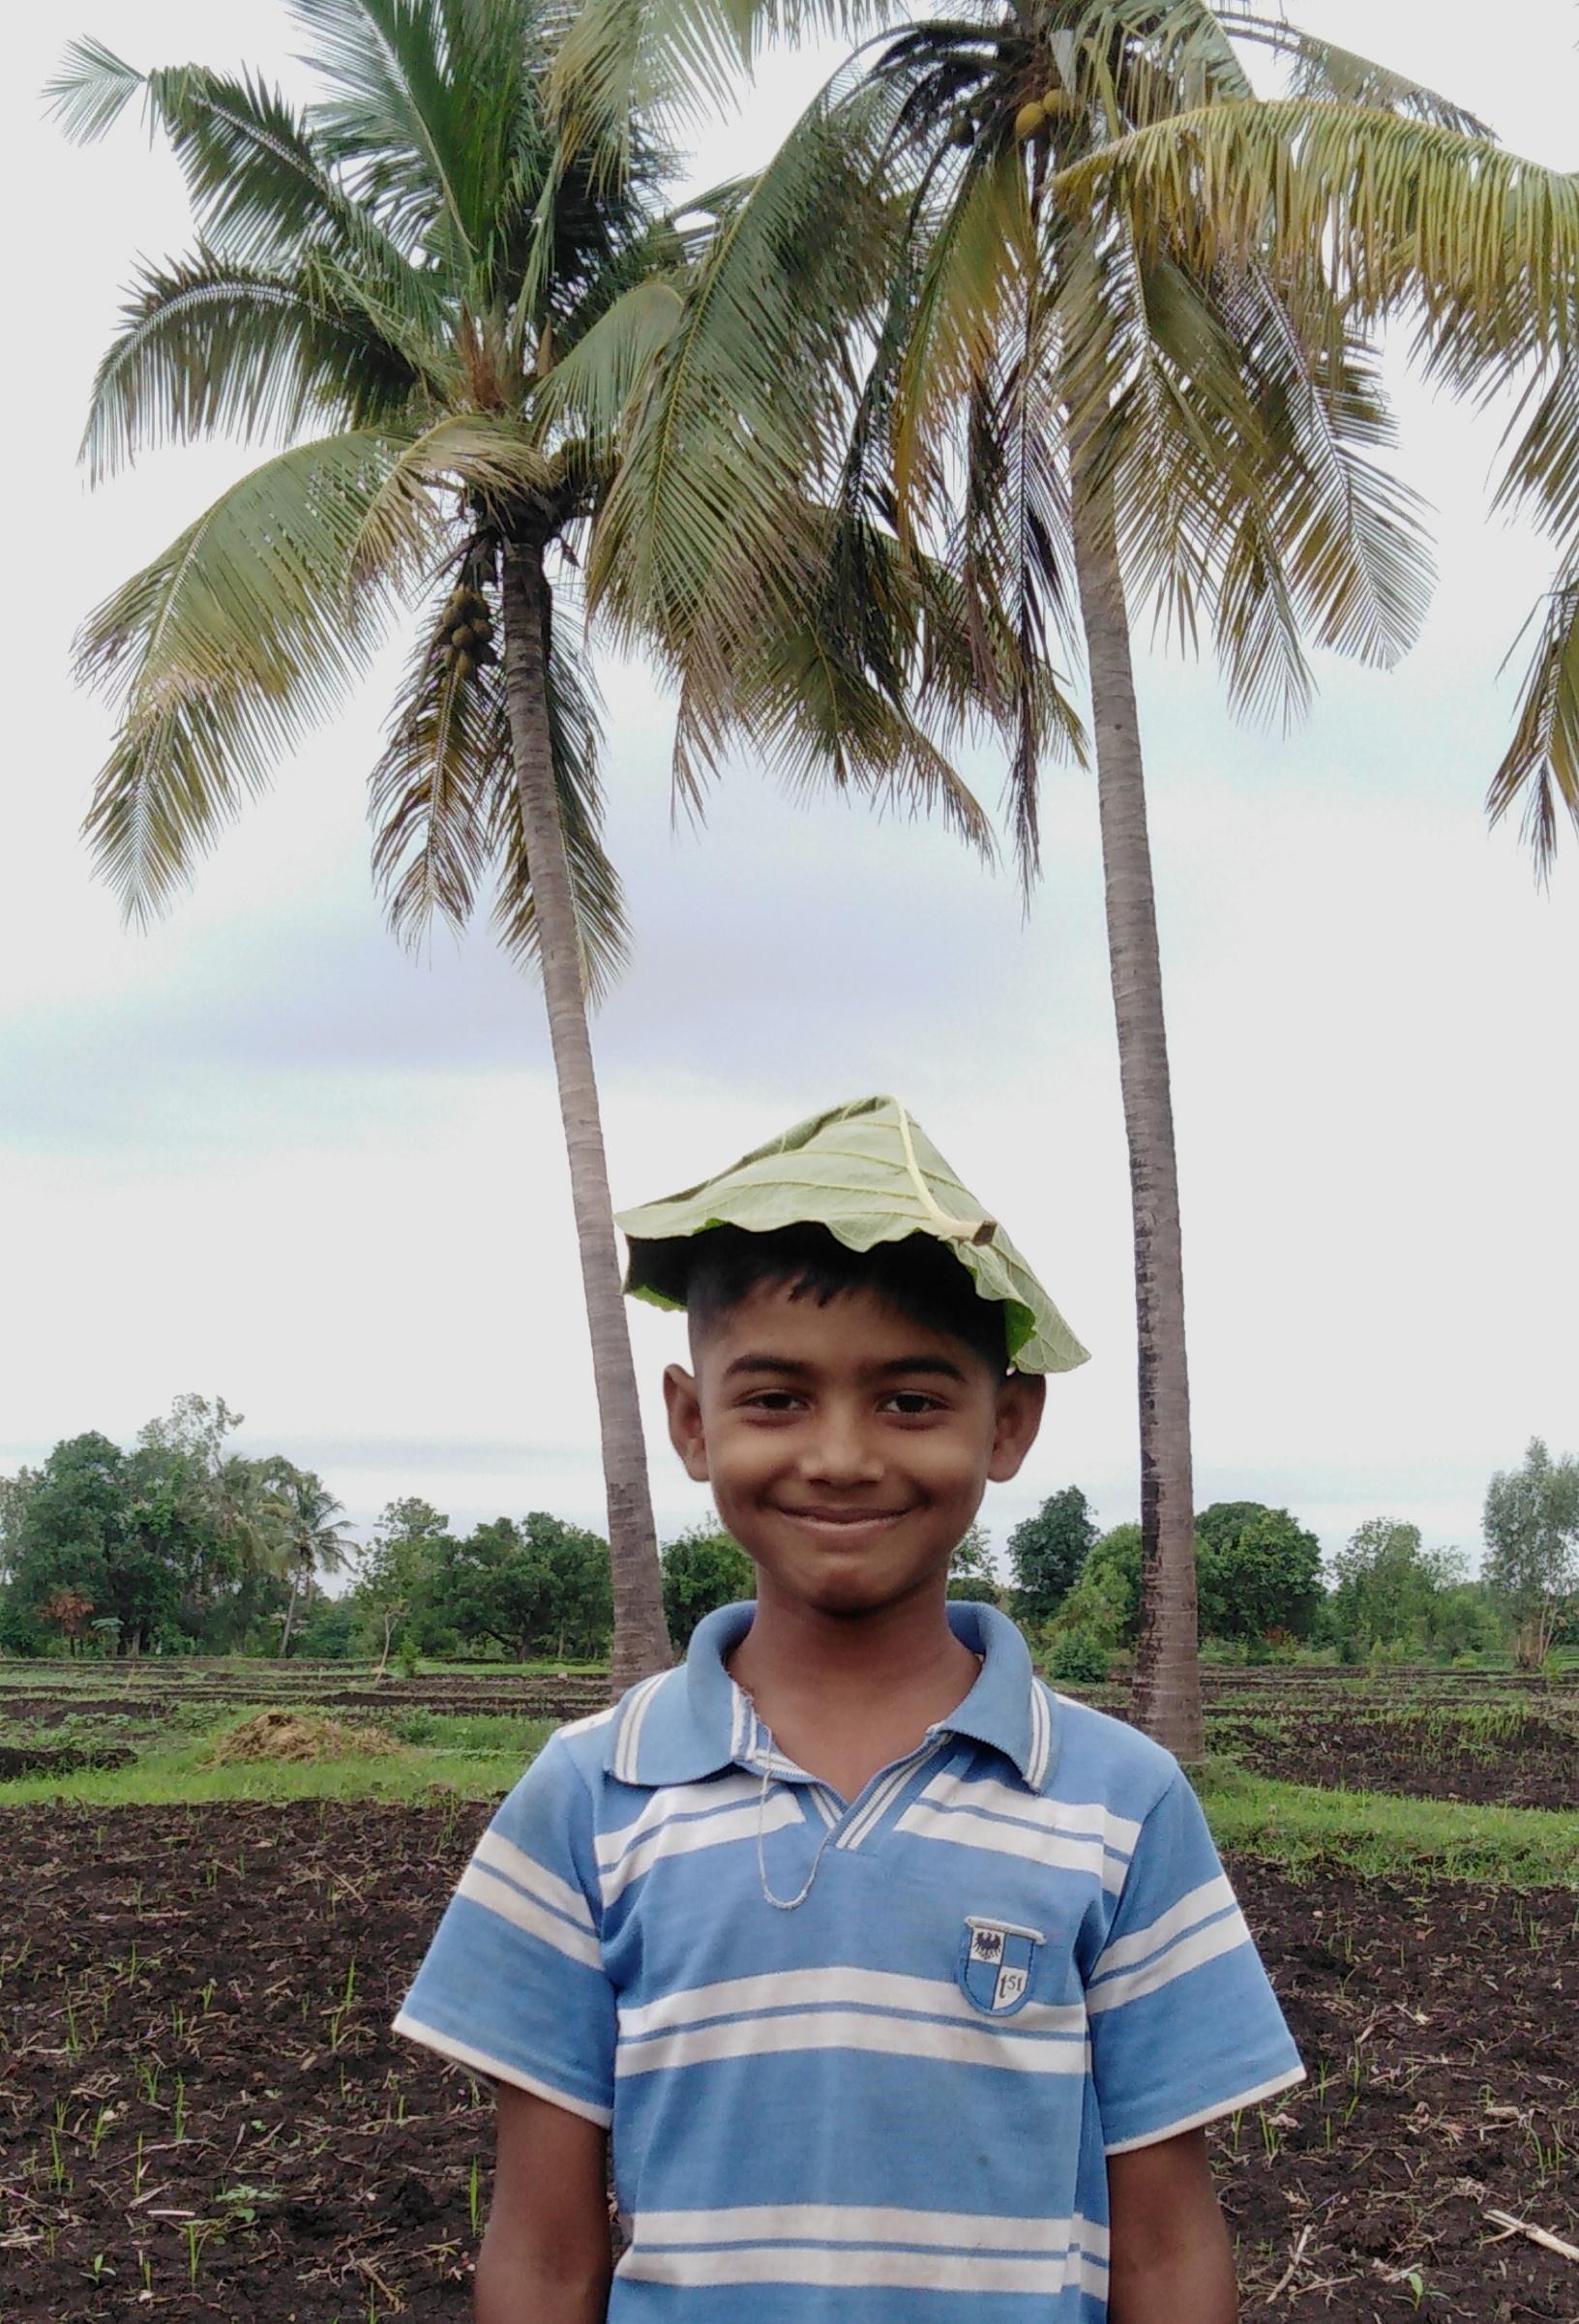 Happy kid with banana leaf on head